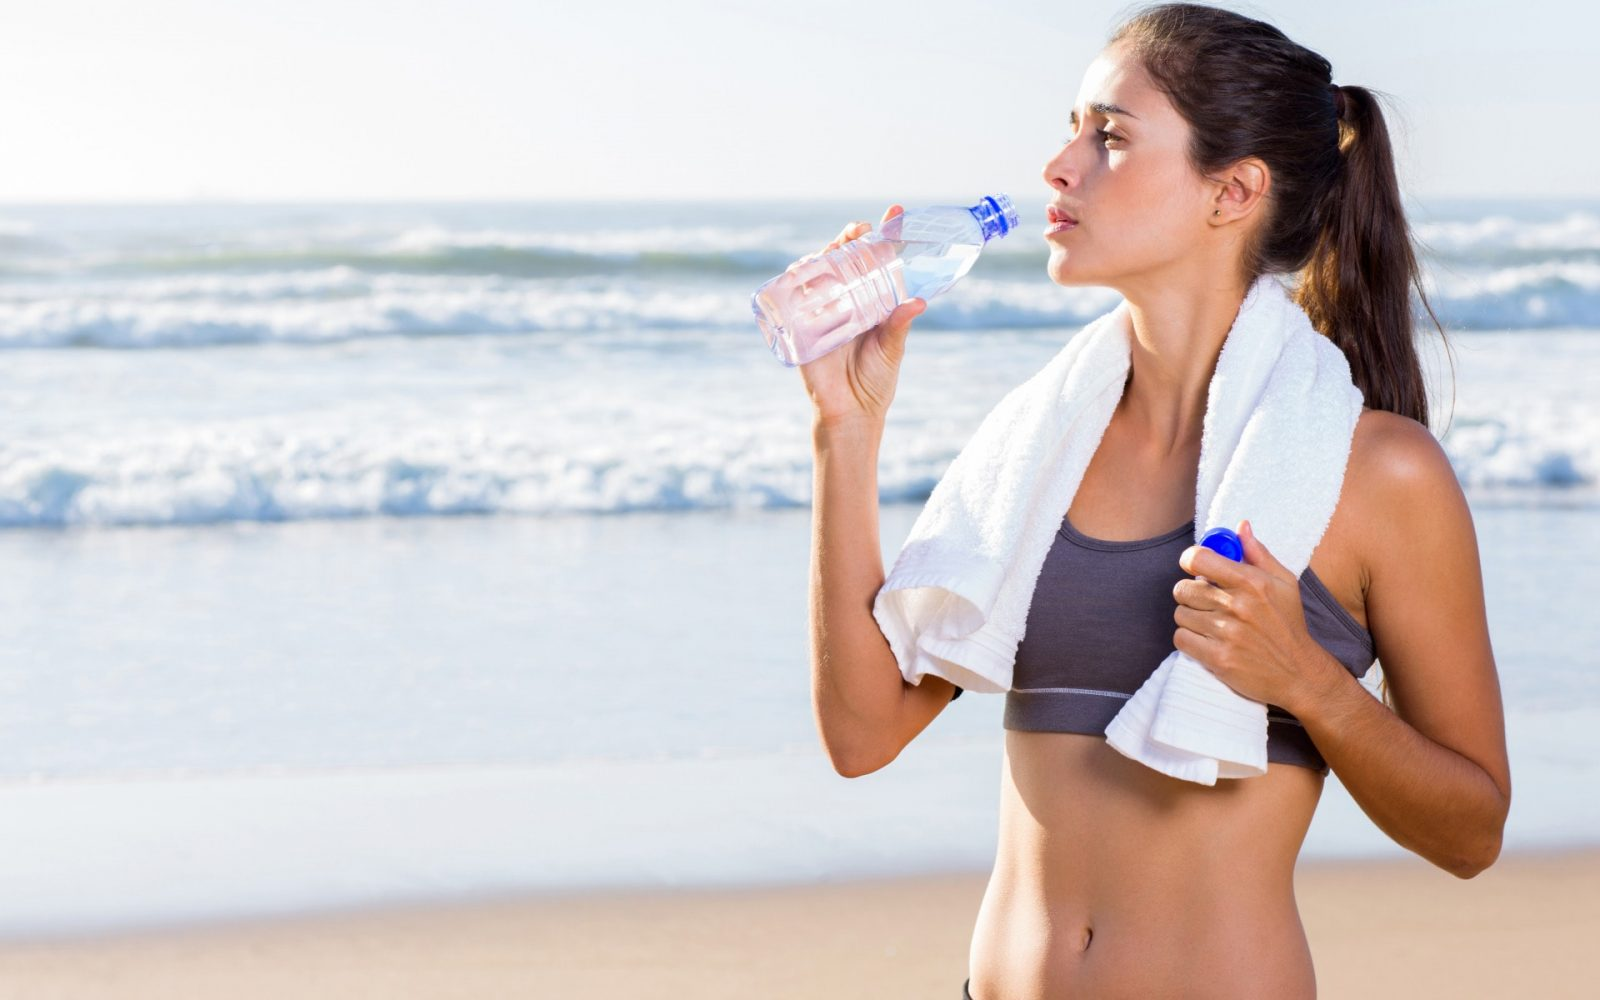 Девушка на берегу море с полотенцем на шеи и голым пузом пьет чистую воду из бутылке